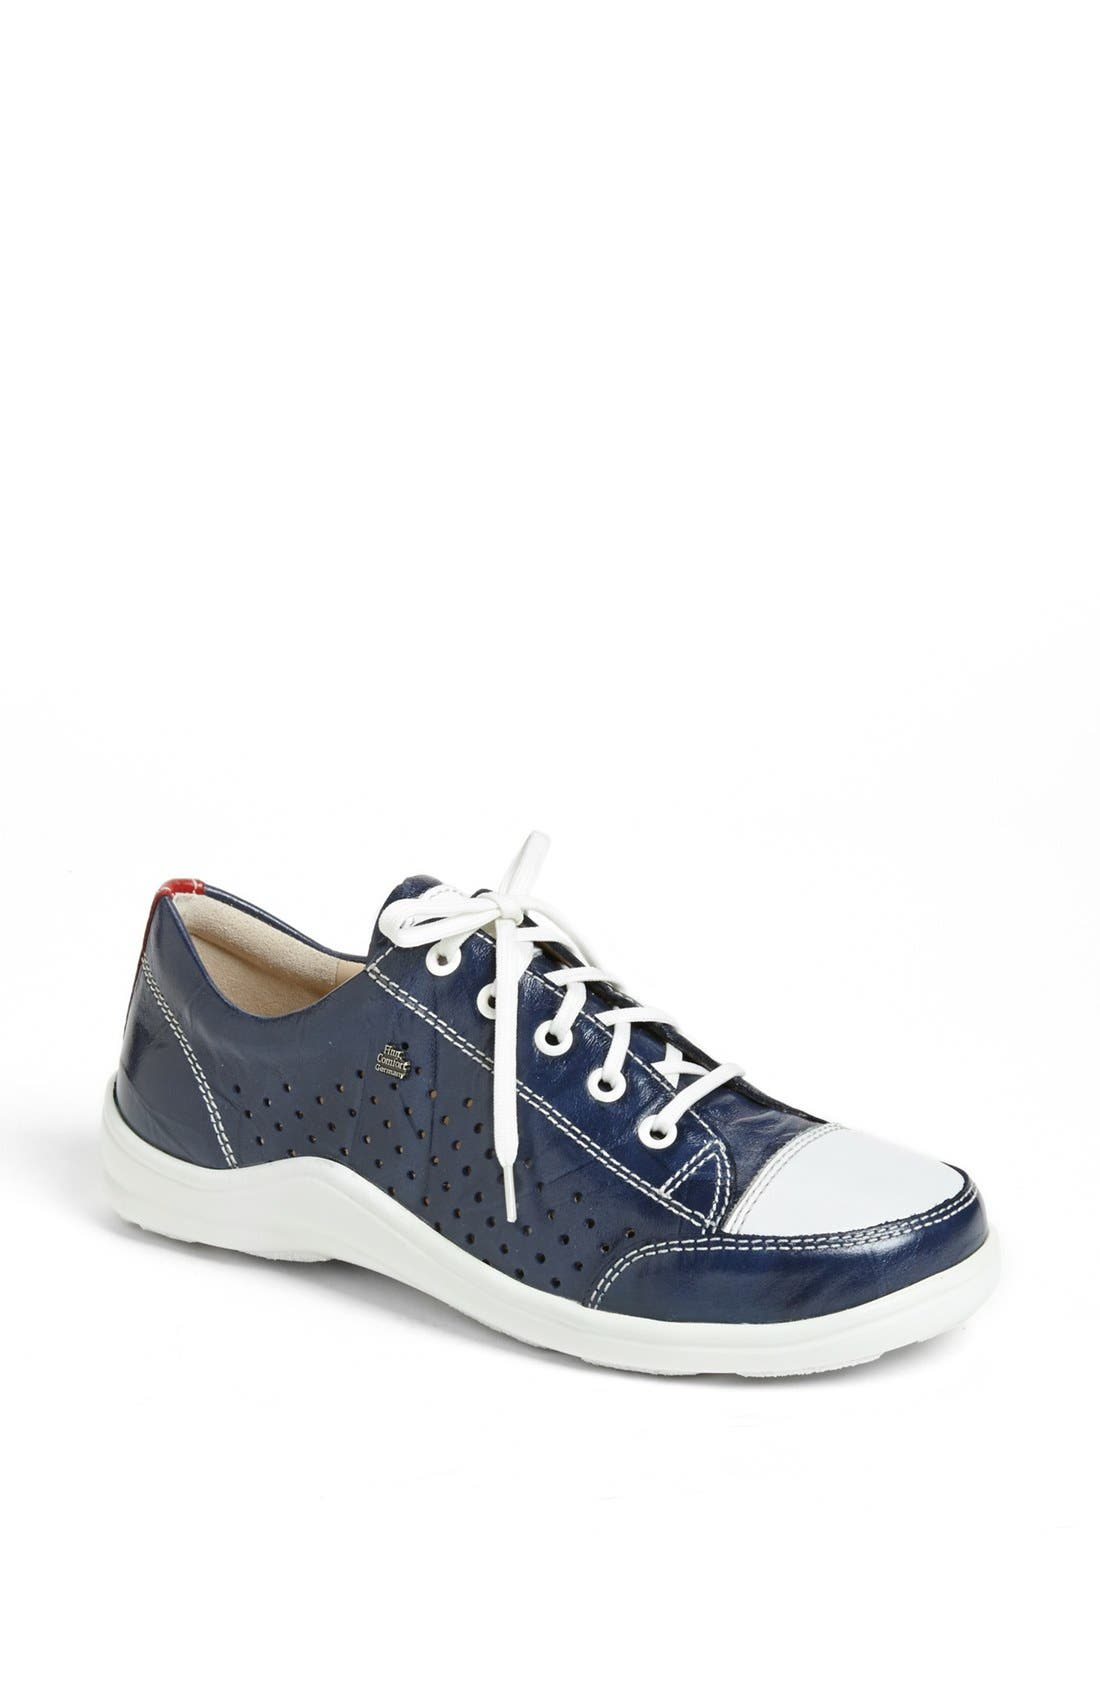 Alternate Image 1 Selected - Finn Comfort Perforated Sneaker (Women)